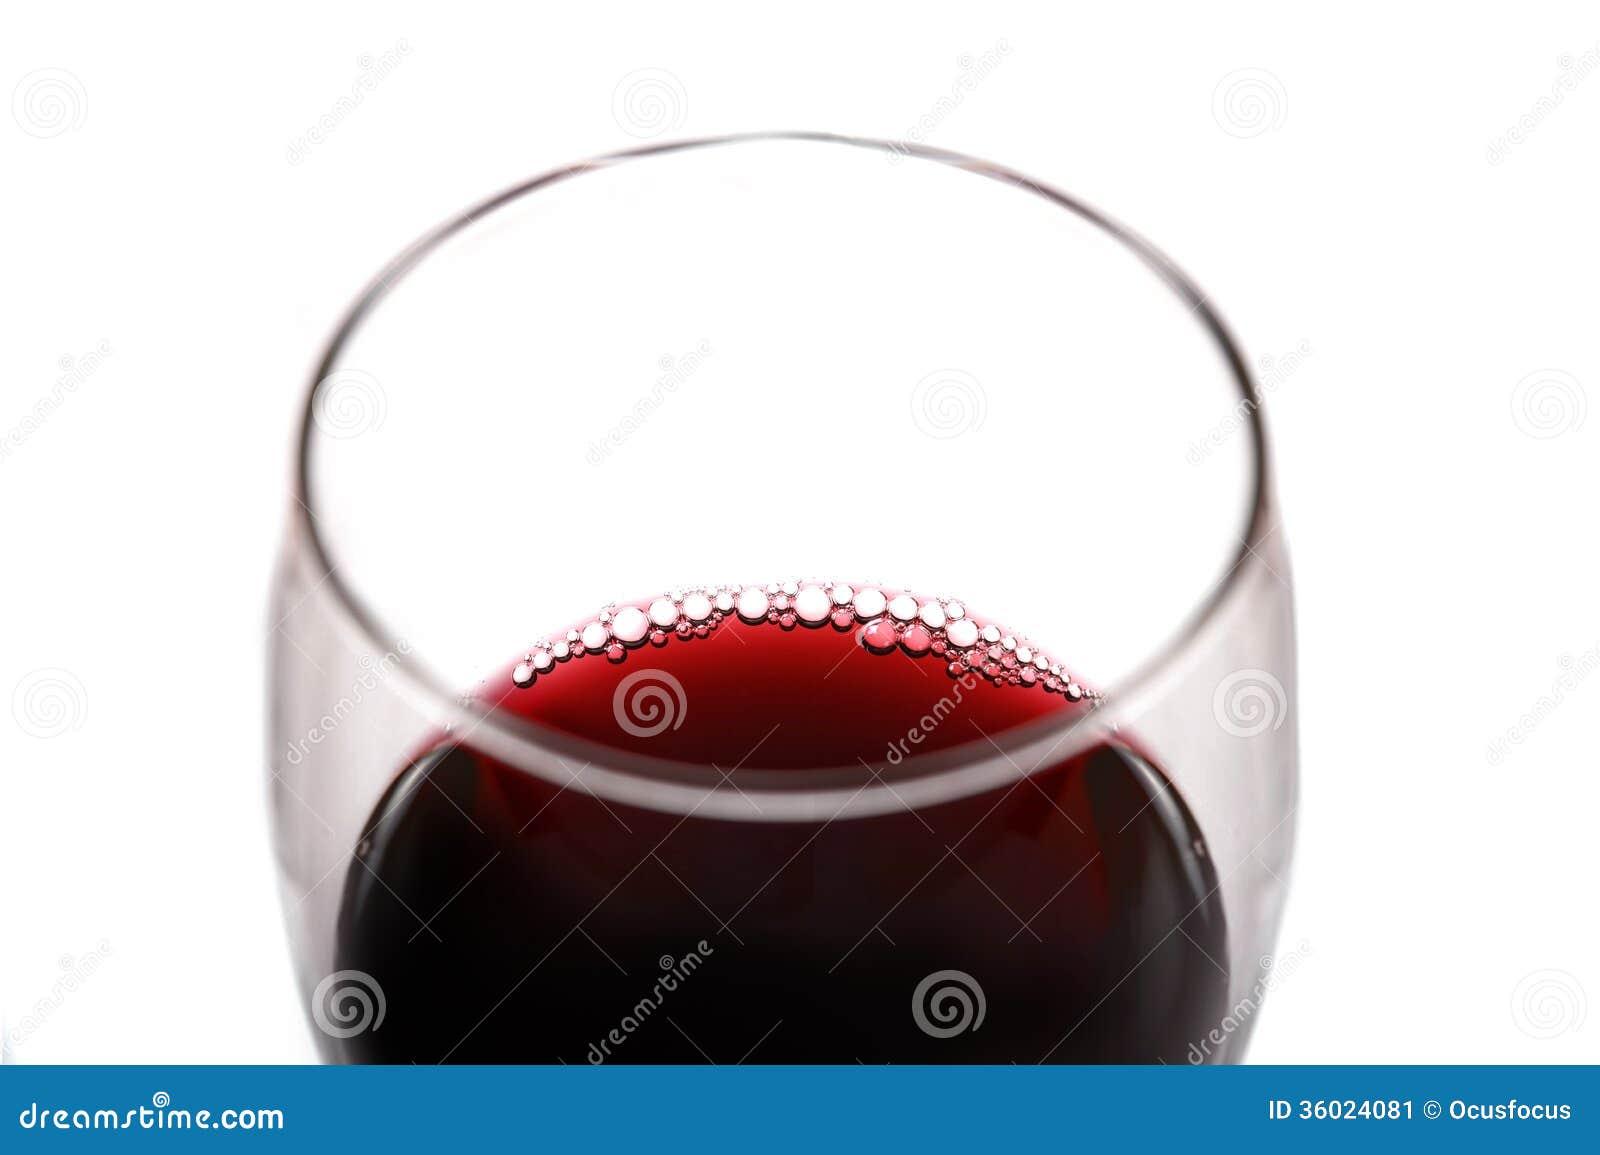 verre de vin rouge avec des bulles image stock image. Black Bedroom Furniture Sets. Home Design Ideas